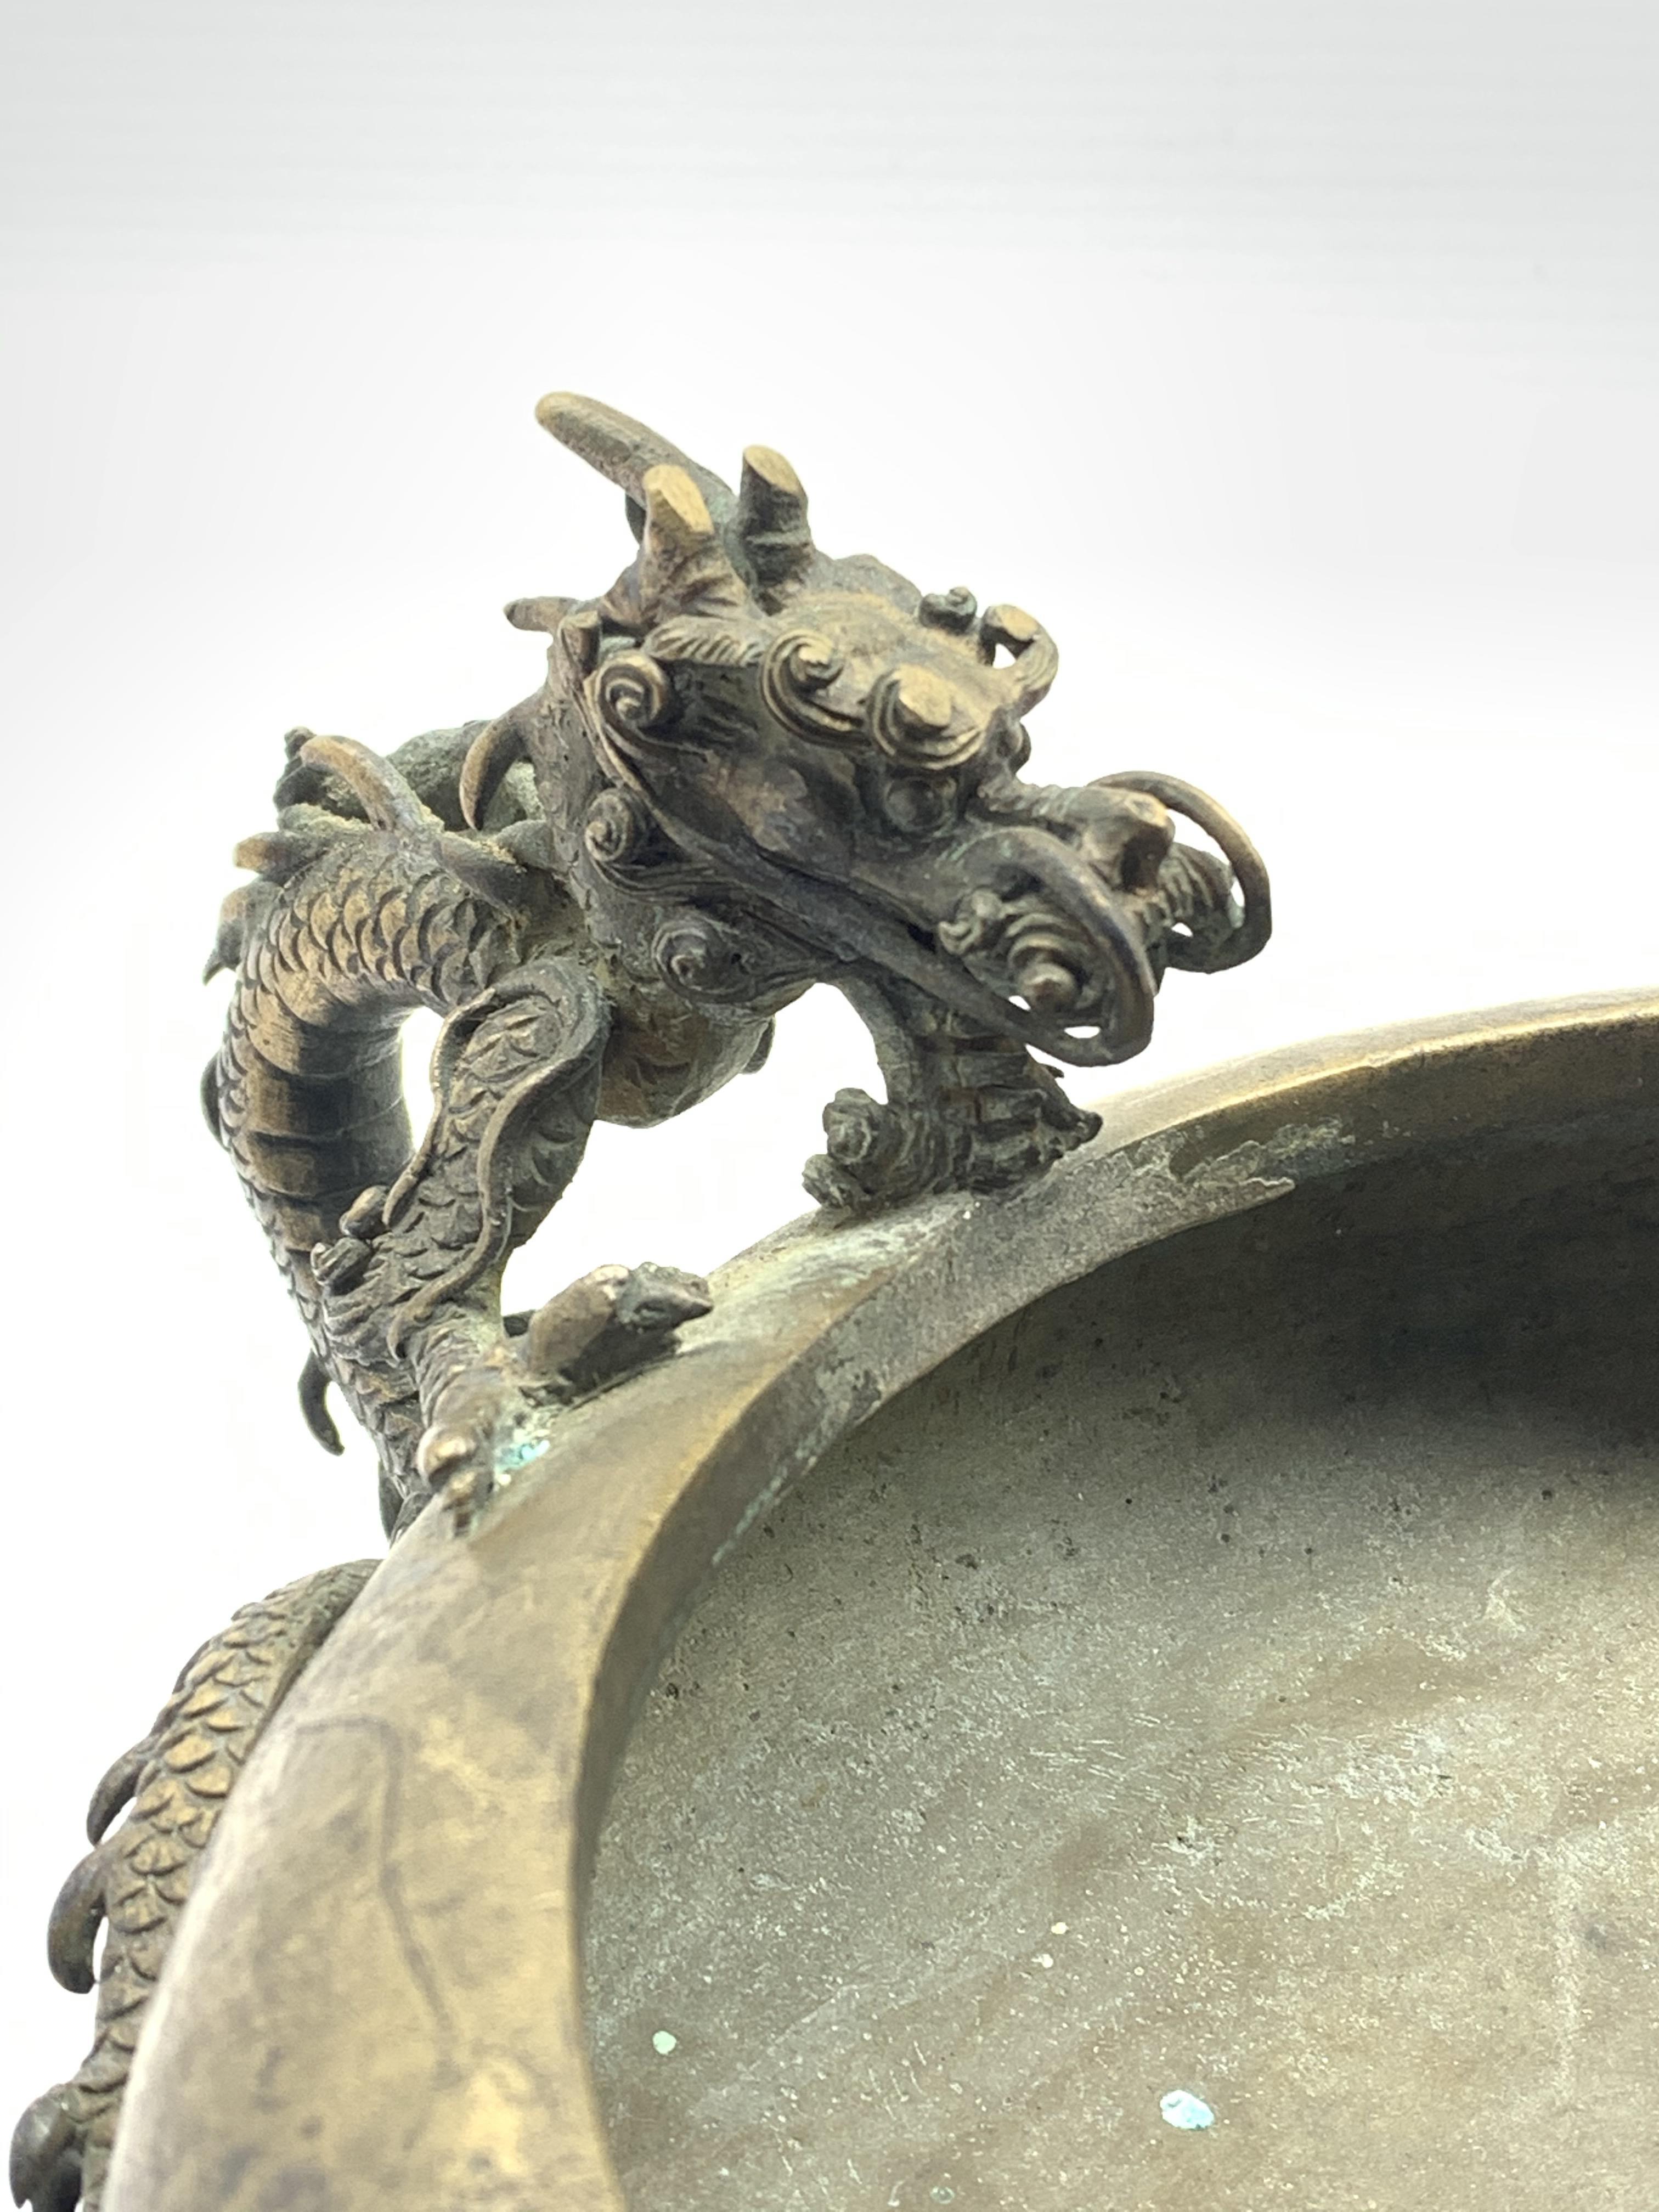 19th century Japanese bronze censer - Image 3 of 5